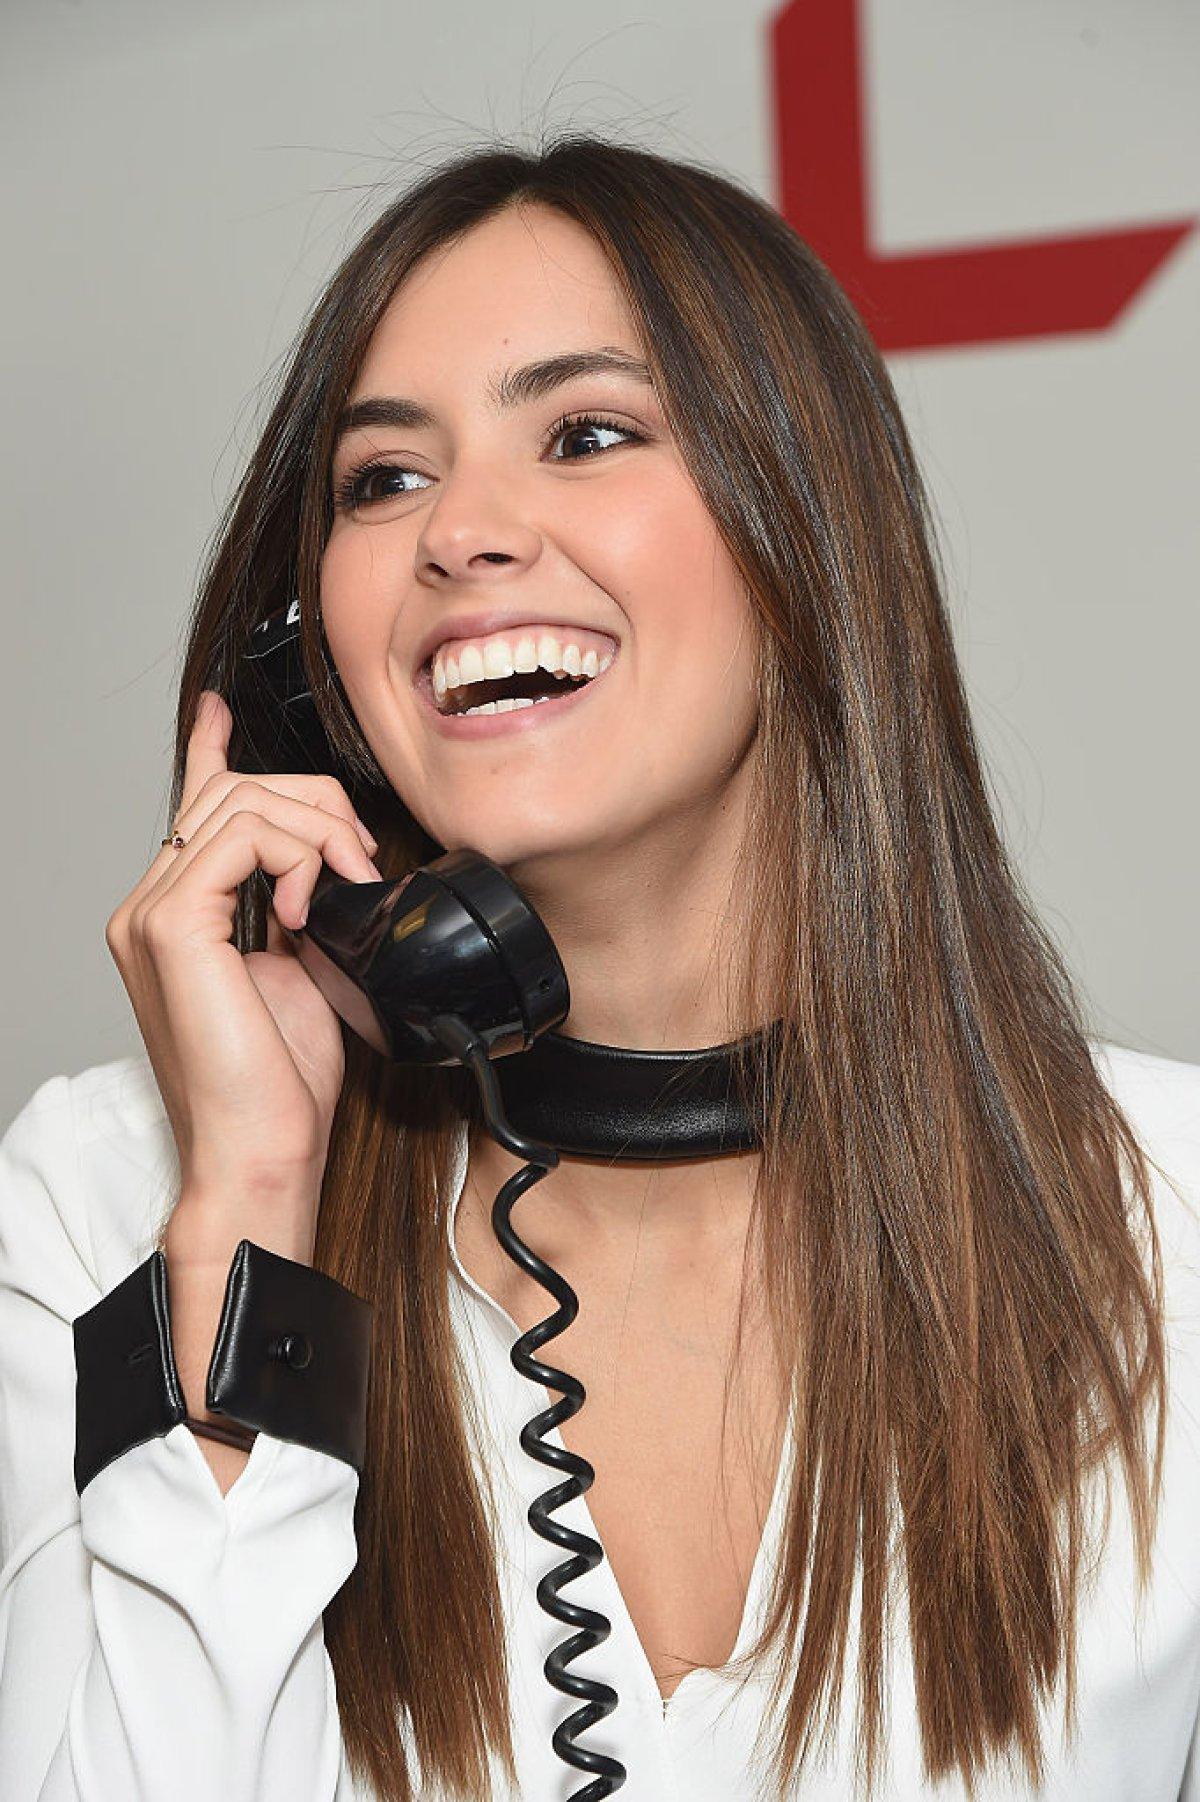 Con este piropo, Silvestre Dangond hizo sonrojar a Paulina Vega